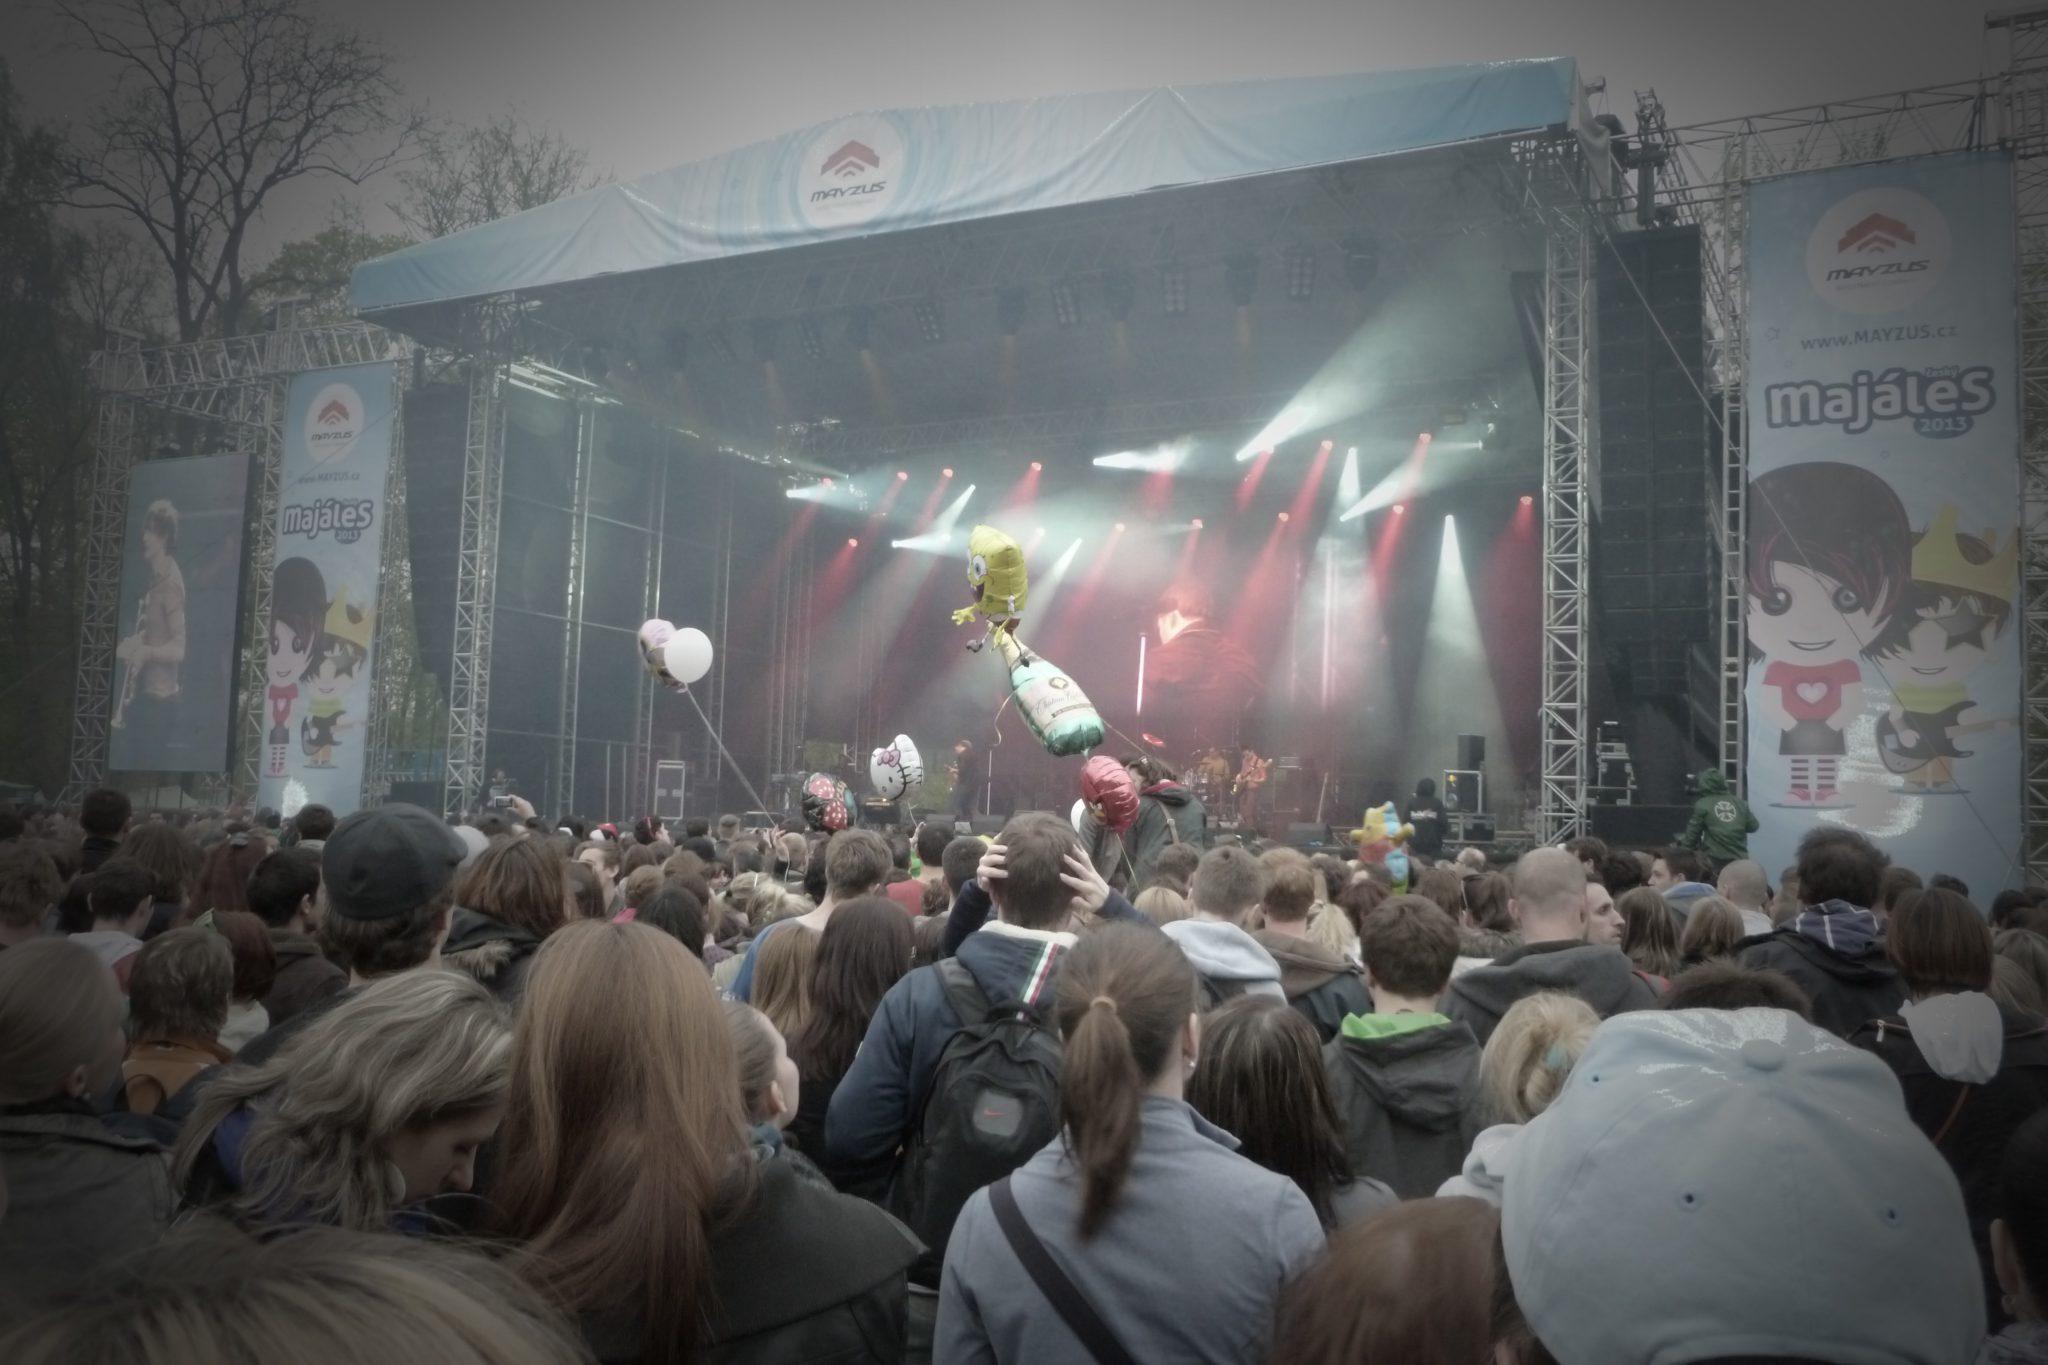 The festival of Majáles | Foreigners cz Blog